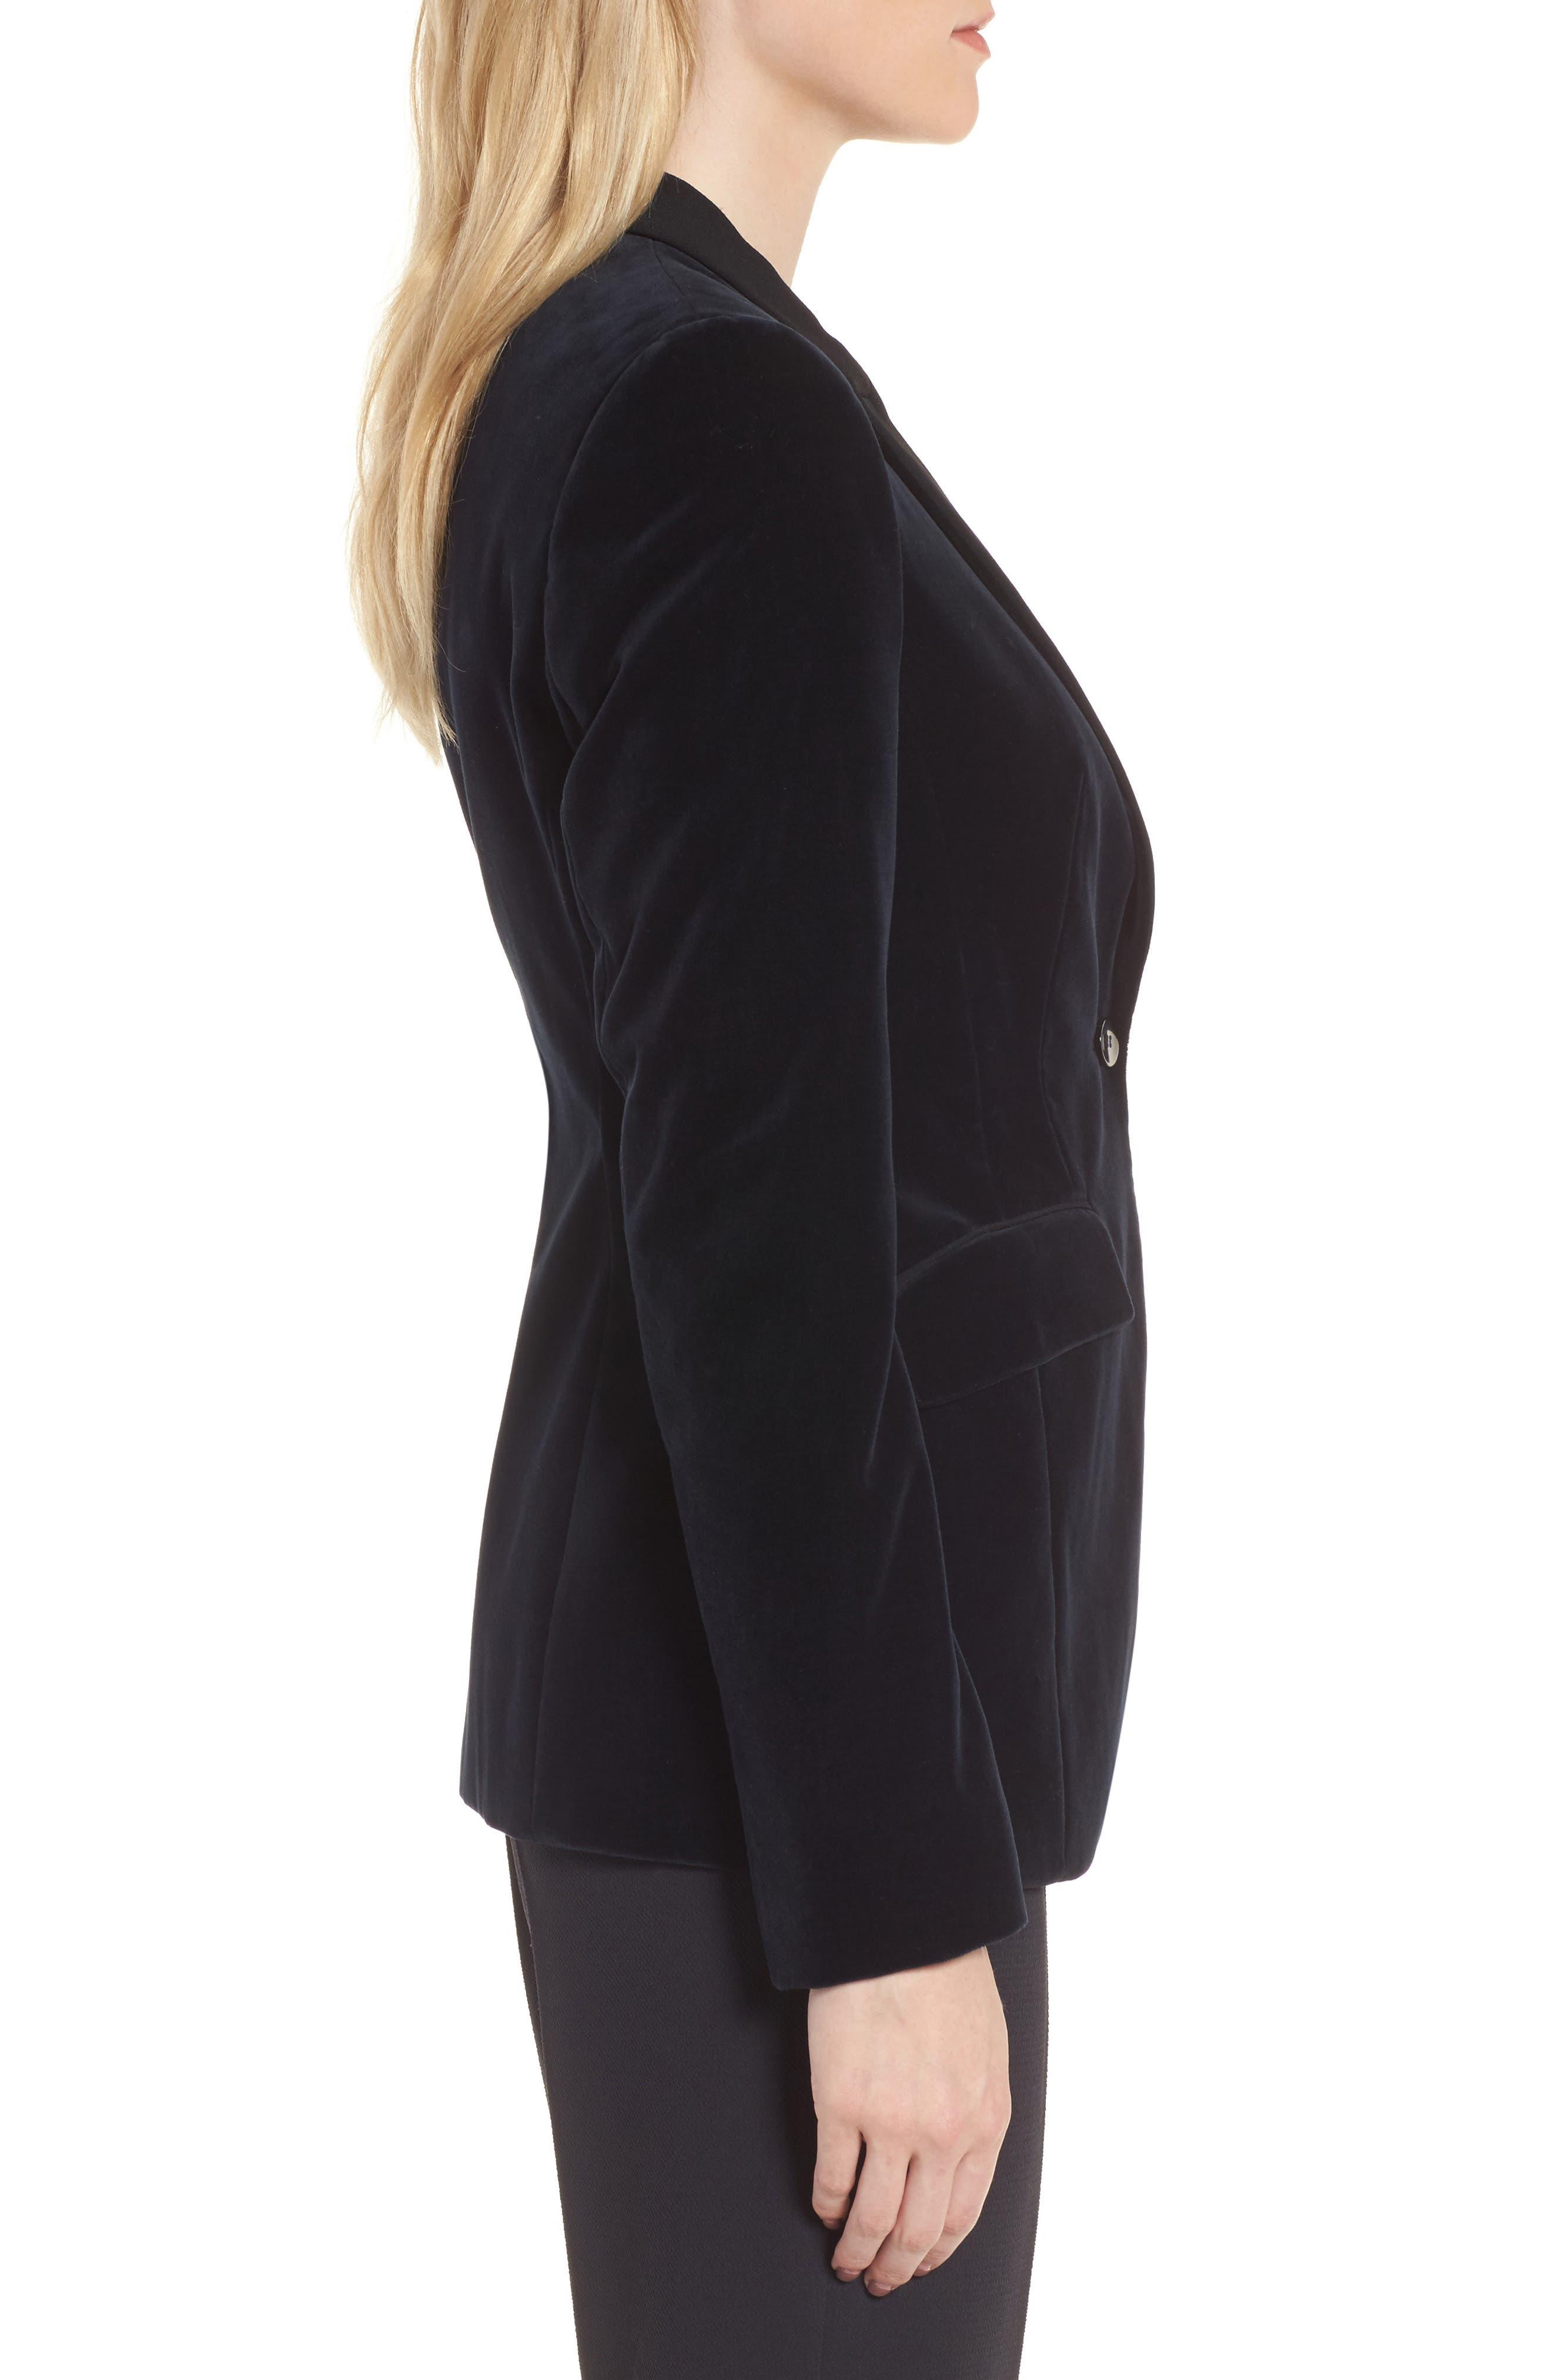 Jeronala Velvet Tuxedo Jacket,                             Alternate thumbnail 3, color,                             480